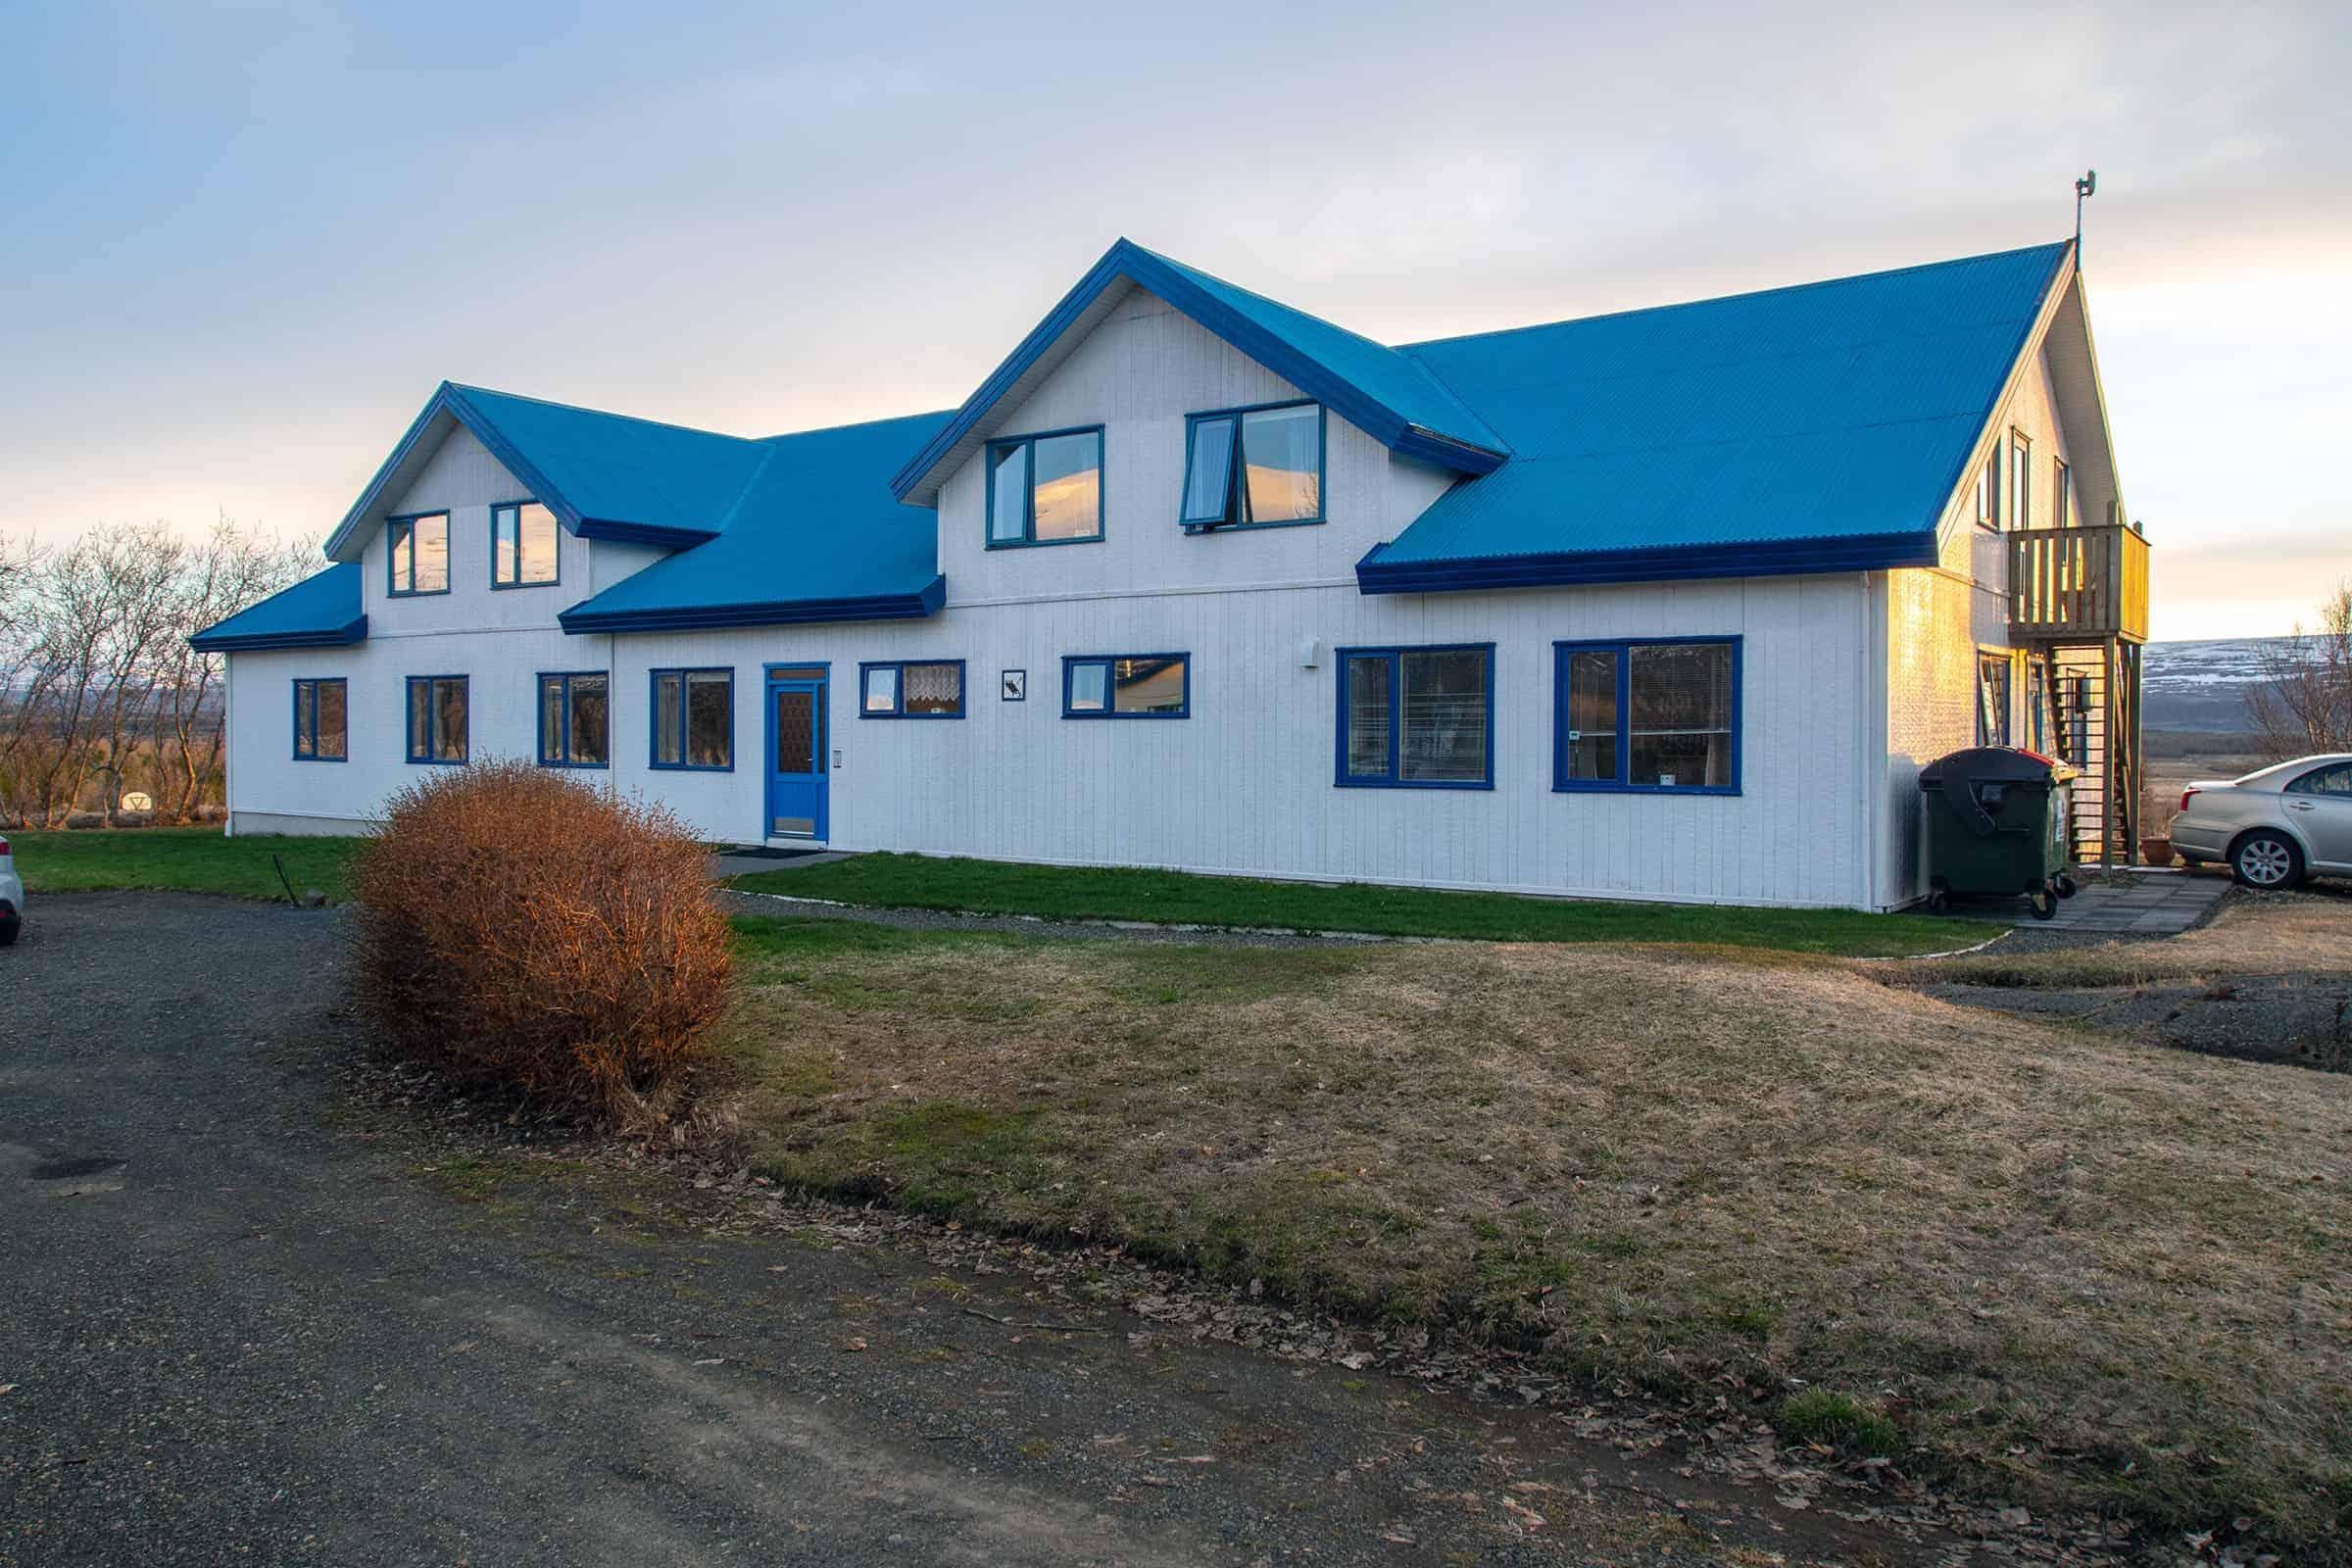 Eyjolfsstadir guesthouse